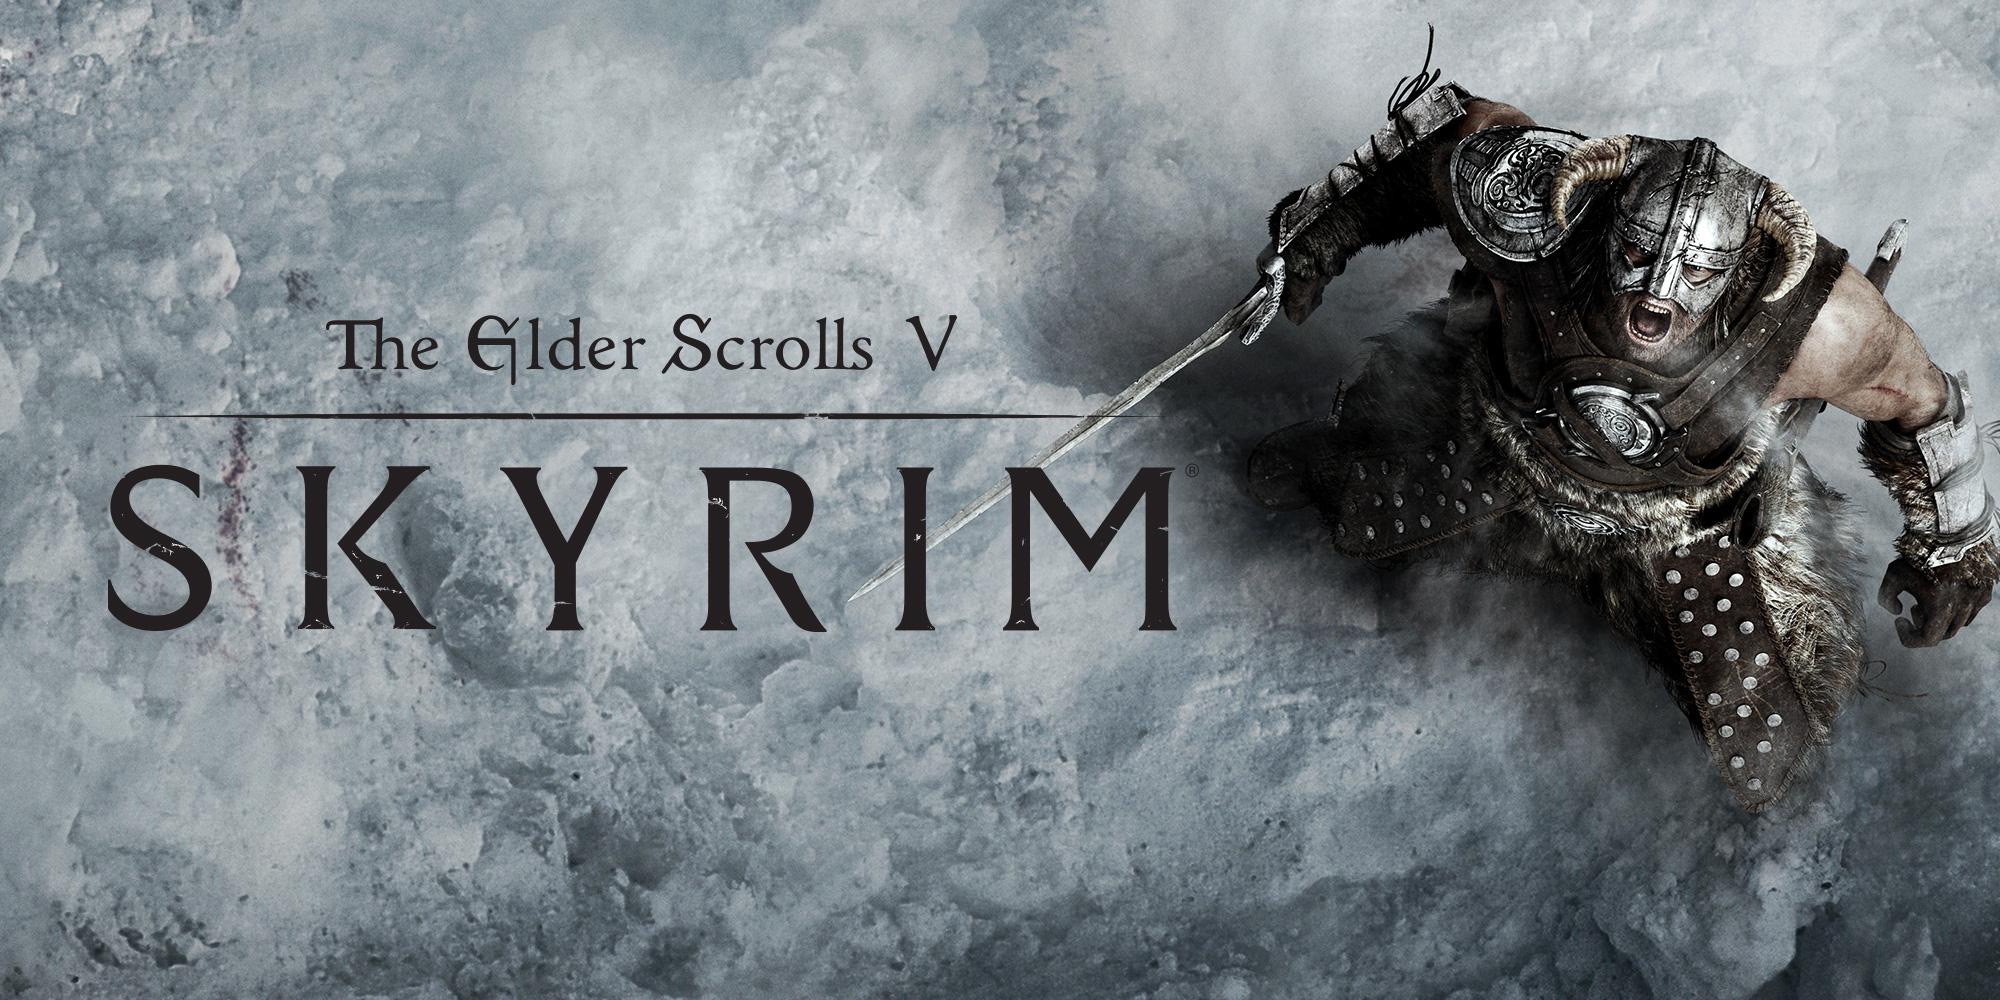 The Elder Scrolls V Skyrim Nintendo Switch Games